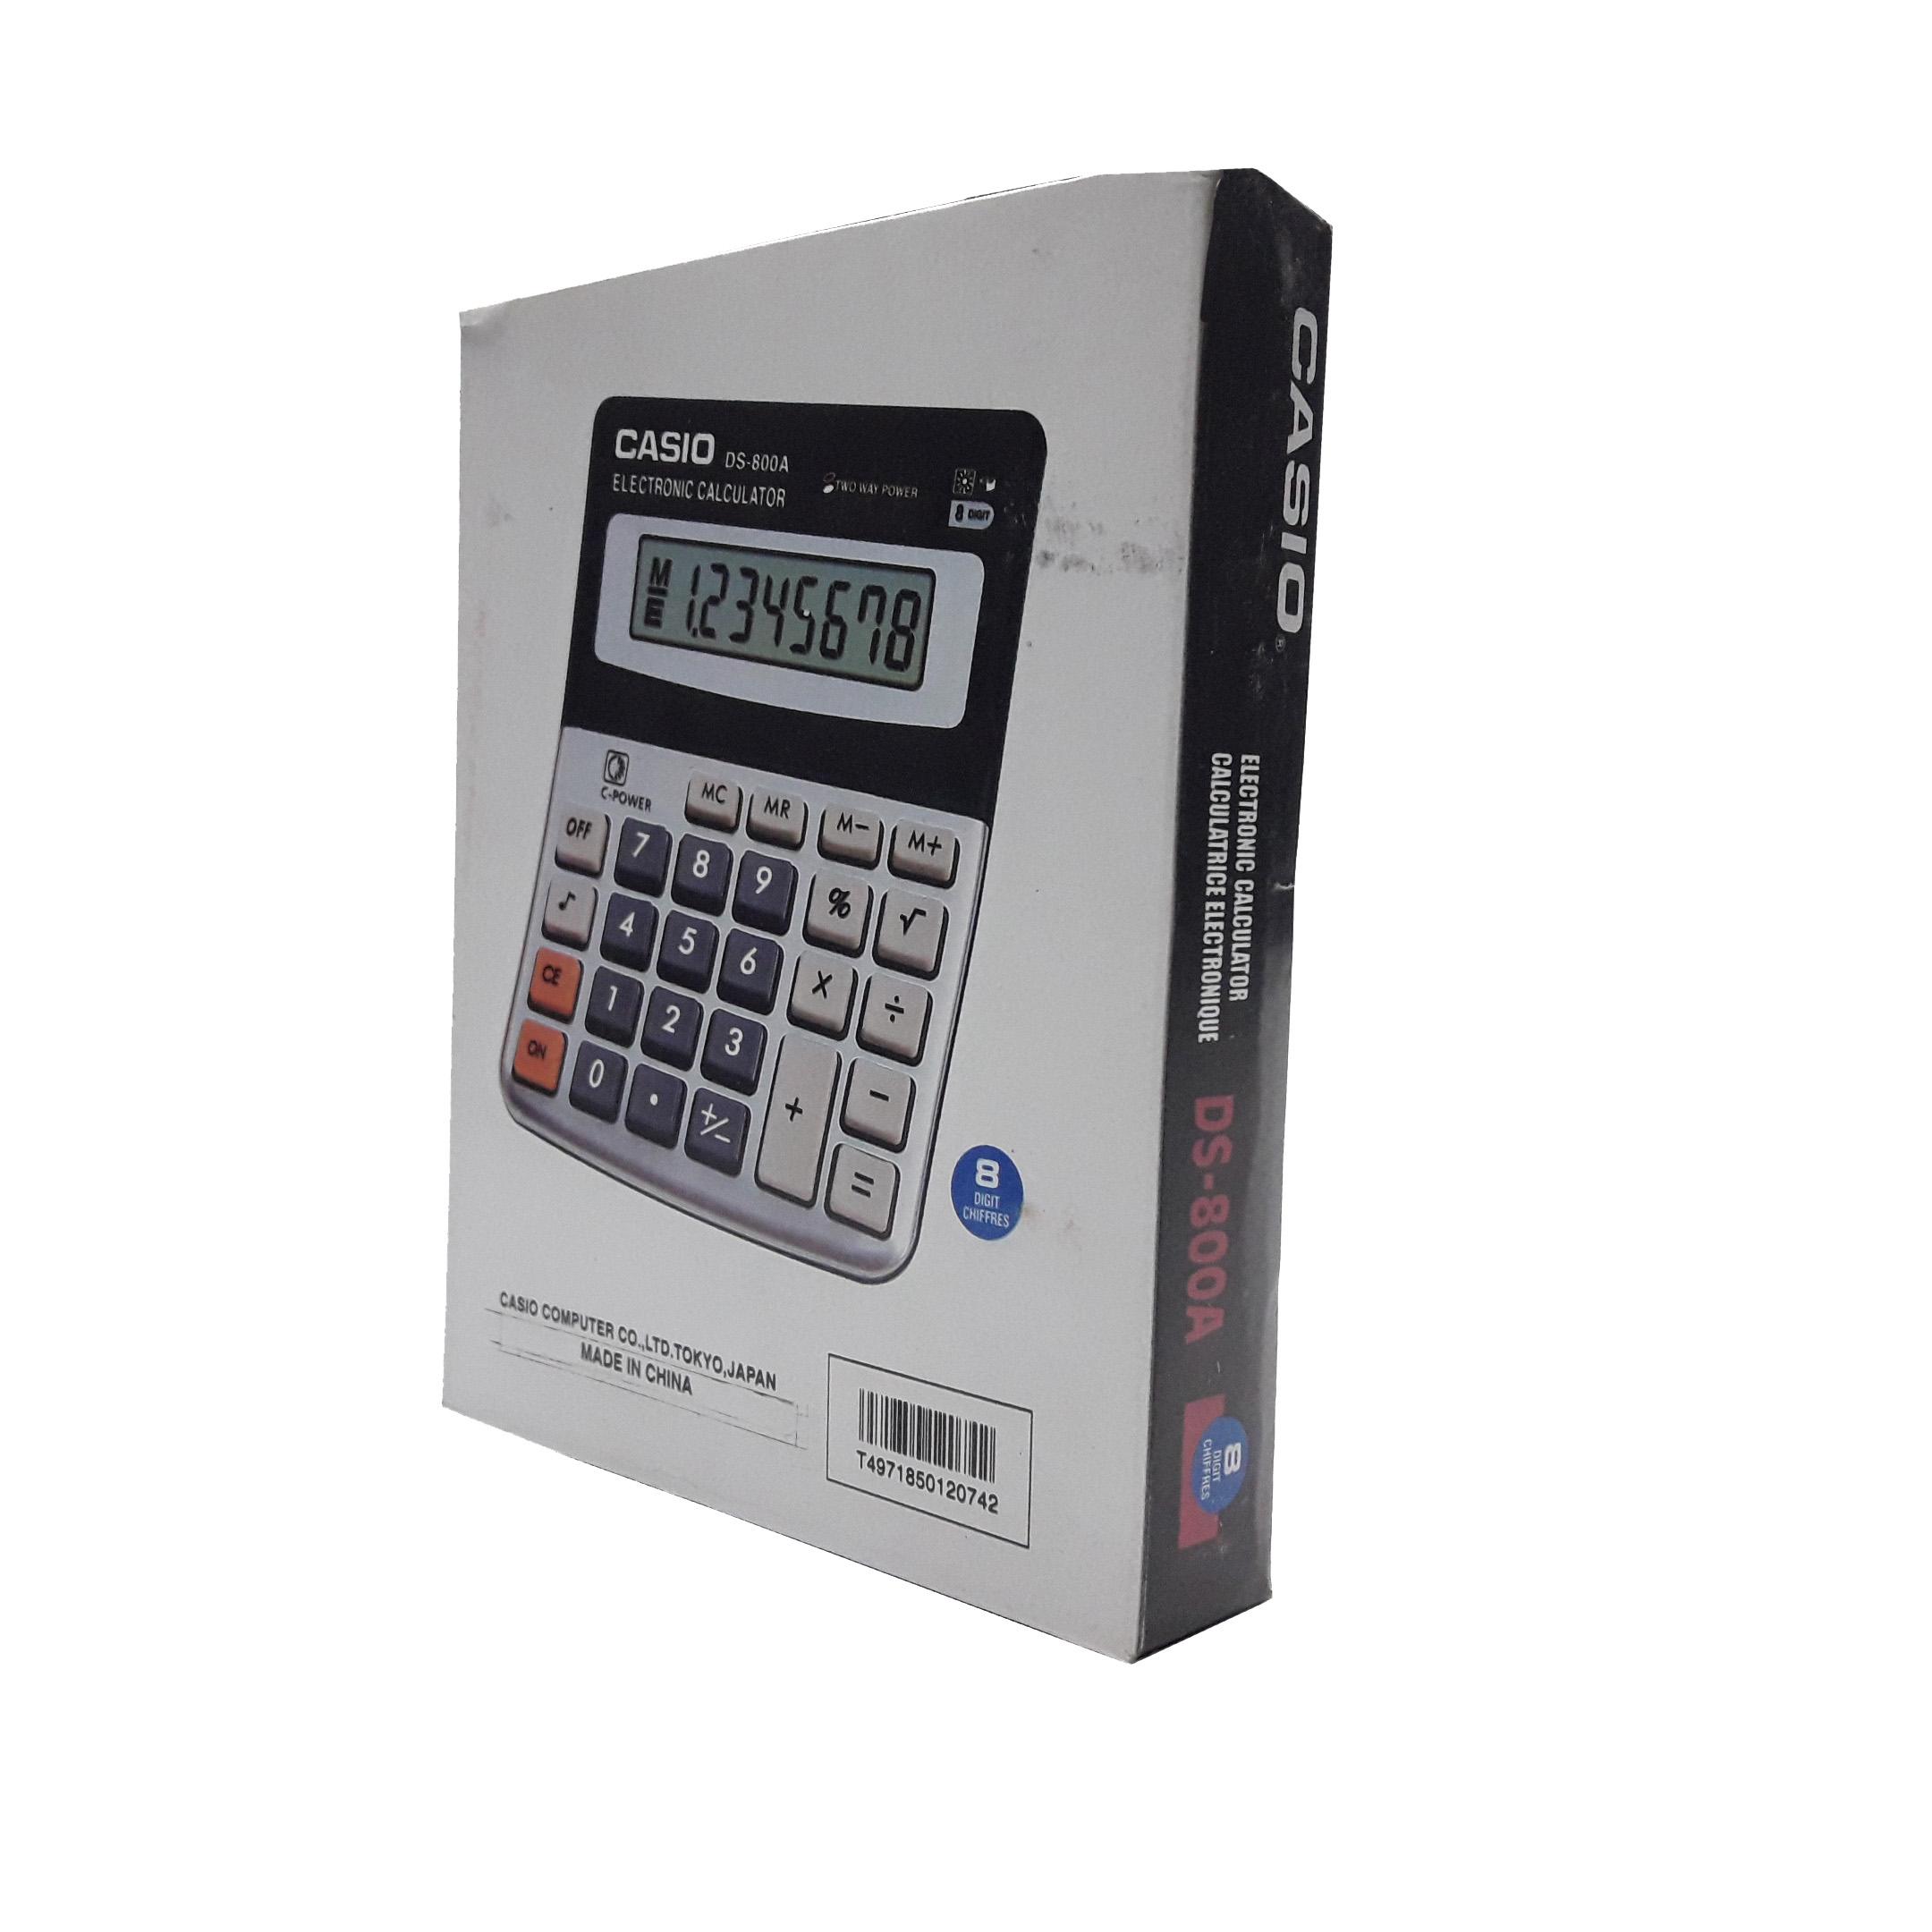 قیمت                      ماشین حساب کاسیو مدل DS-800A